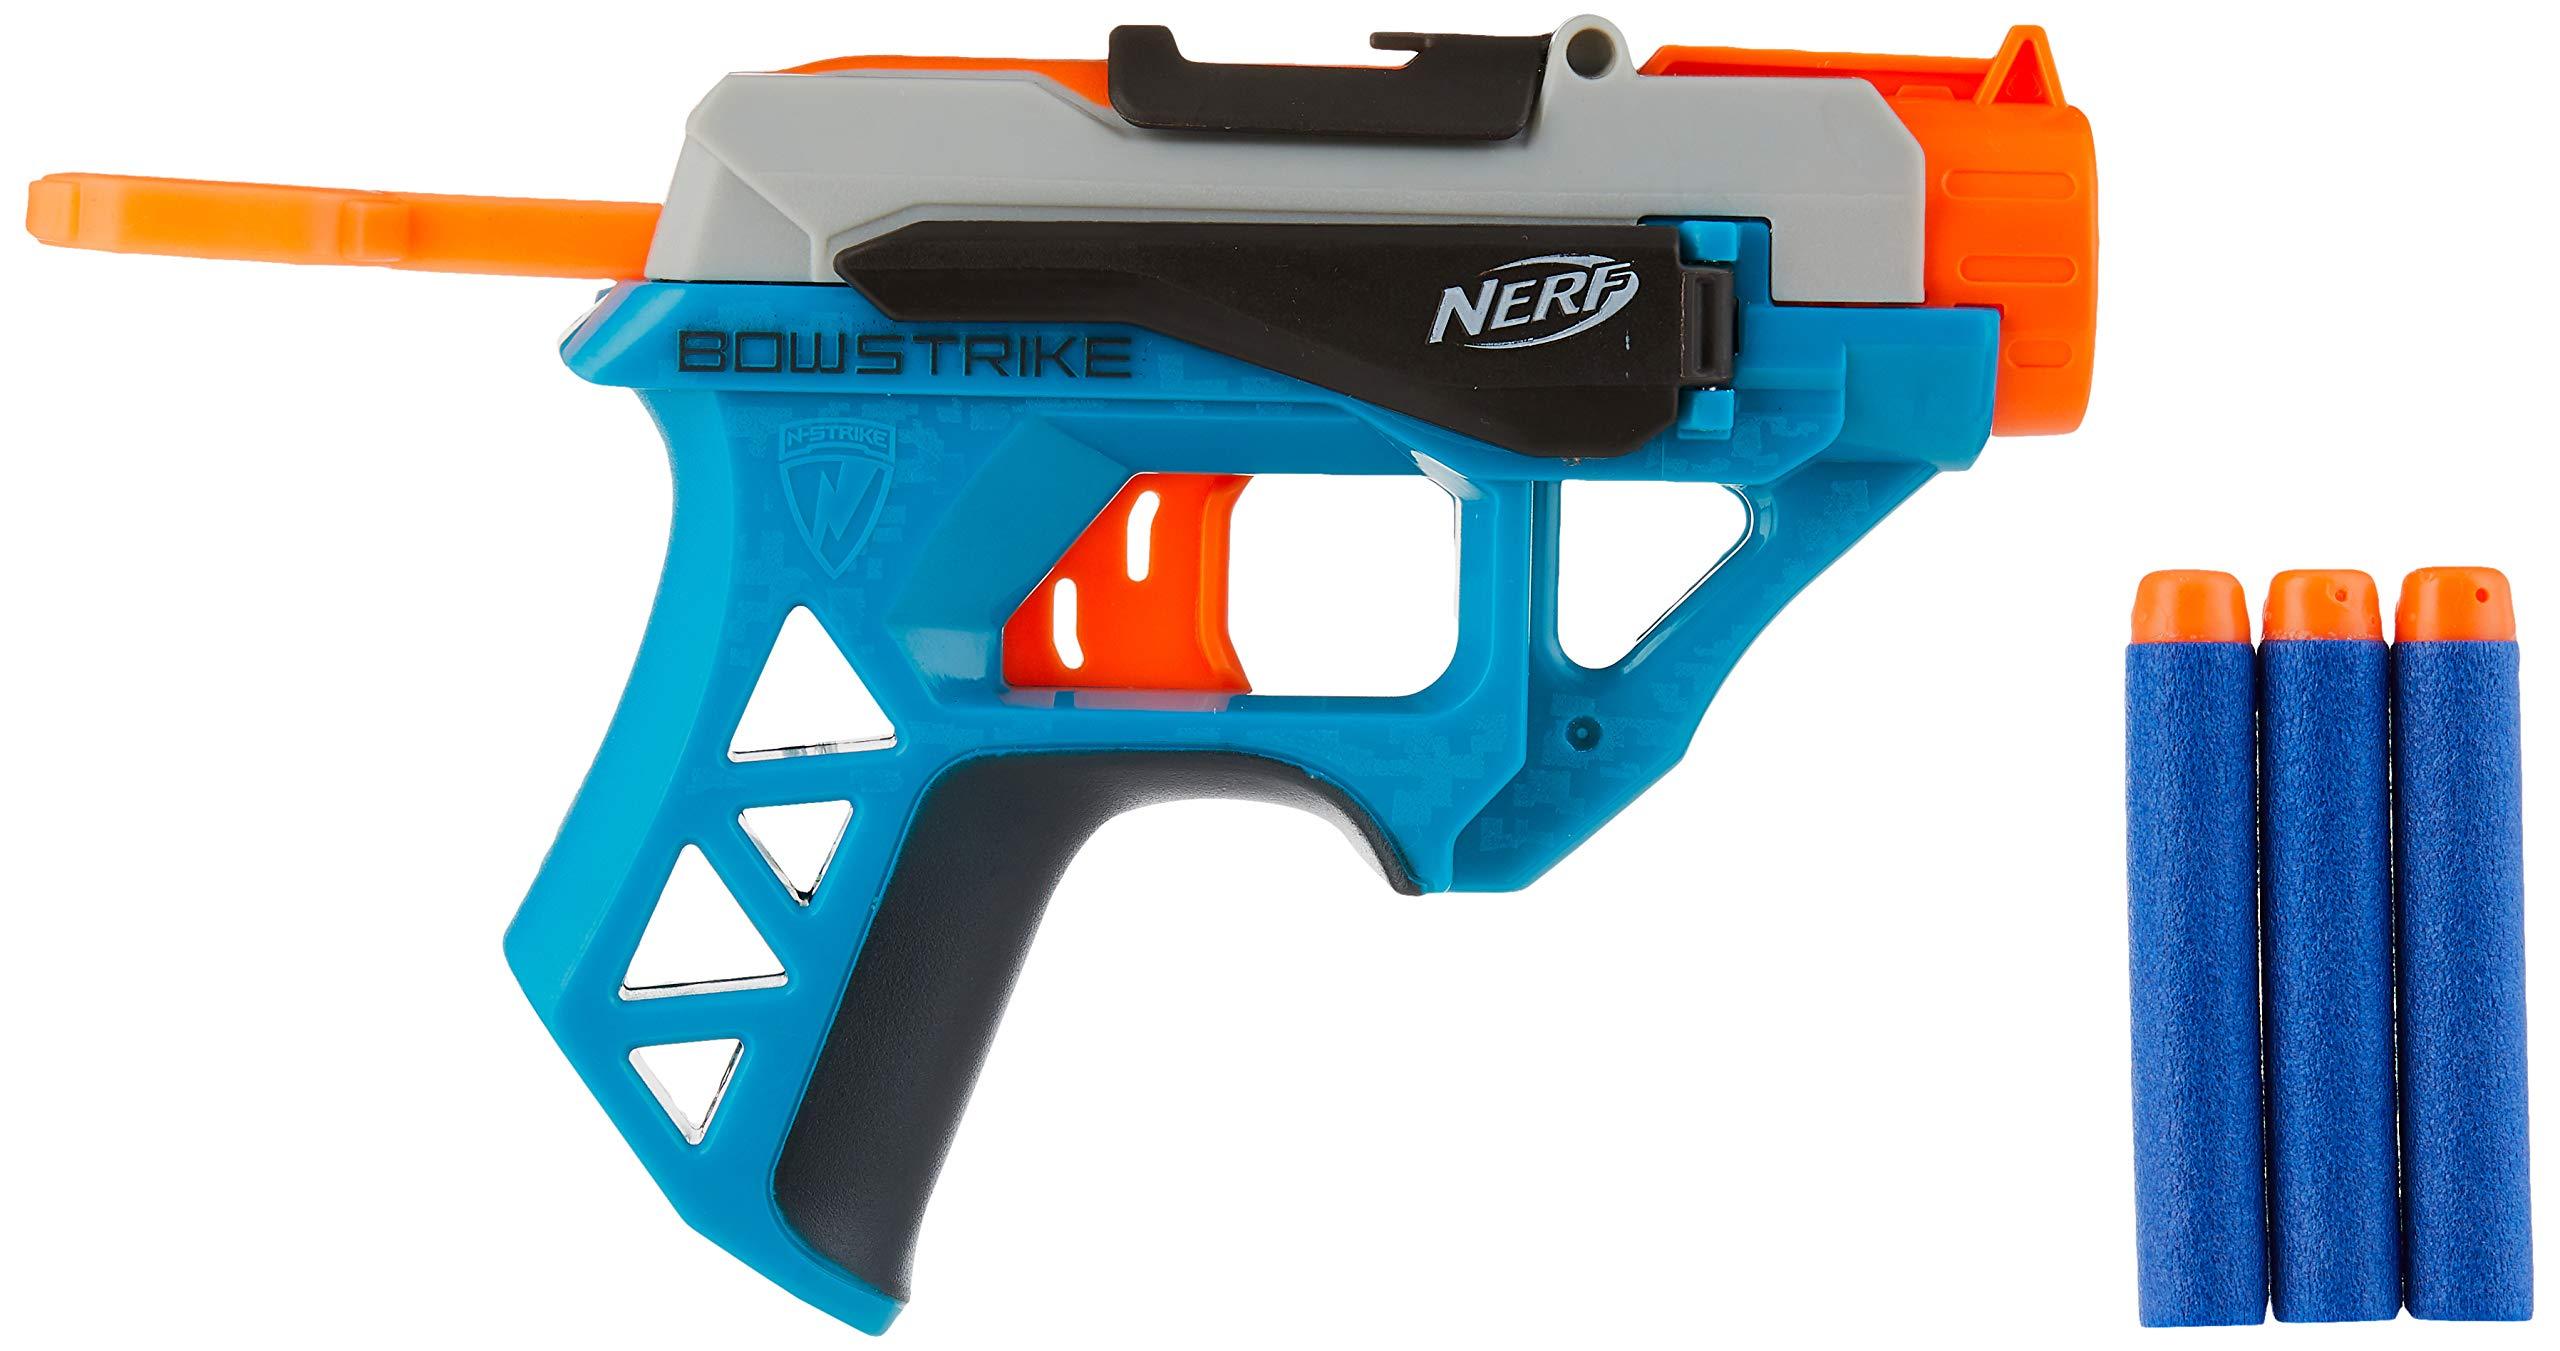 NERF B4614 N Strike BowStrike Blaster